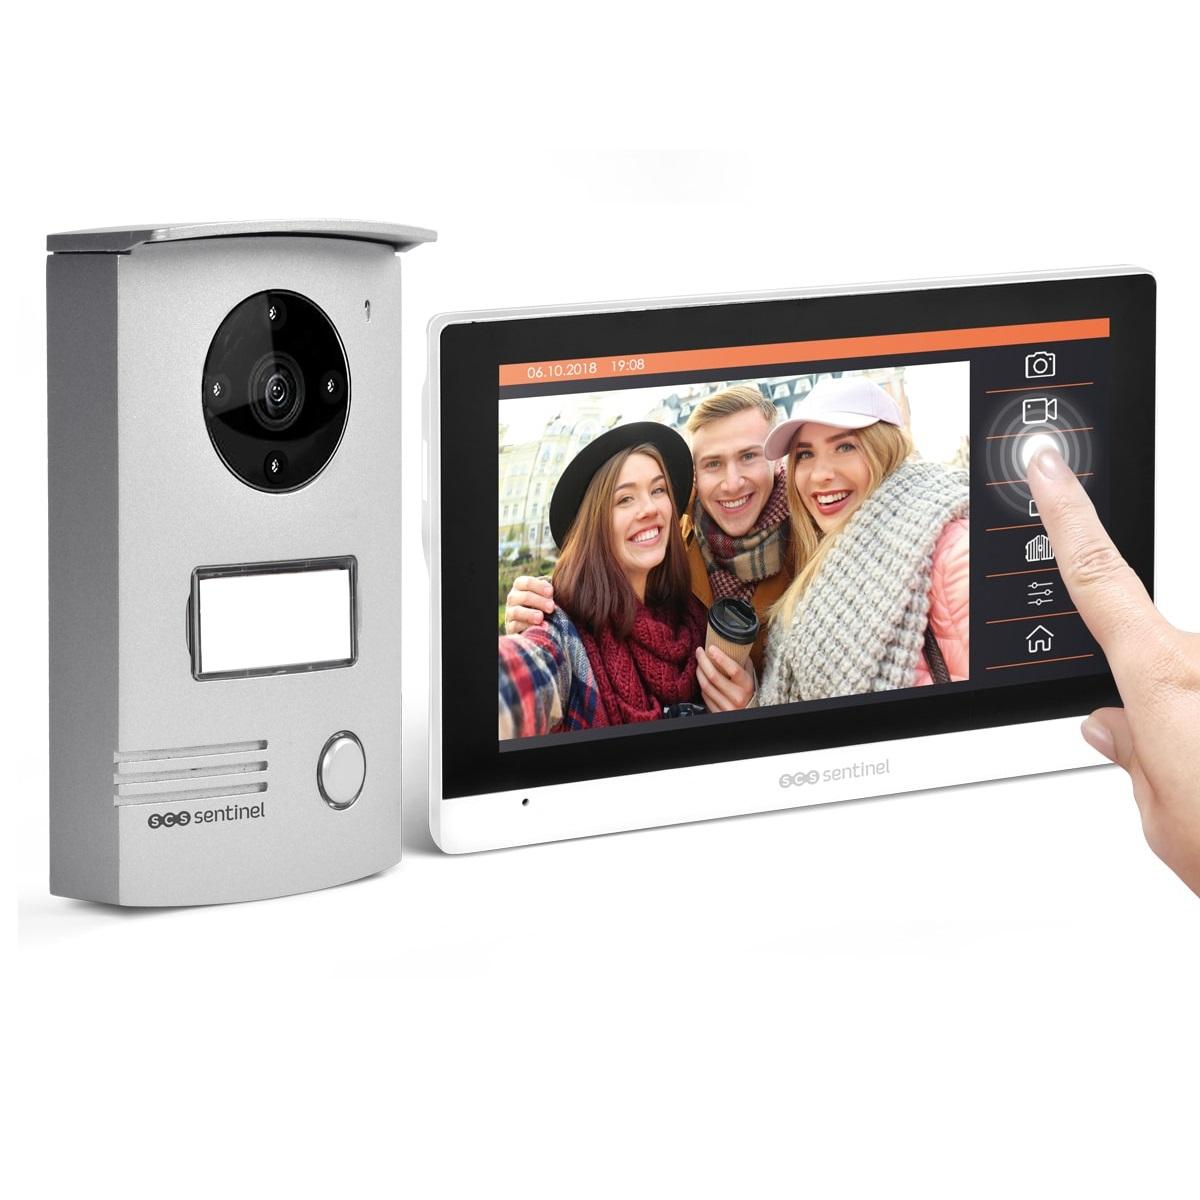 Interfon video cu fir SCS Sentinel VISIODOOR 7+, Ecran tactil de 7 inch, Monitorizare video cu unghi de 120° imagine case-smart.ro 2021